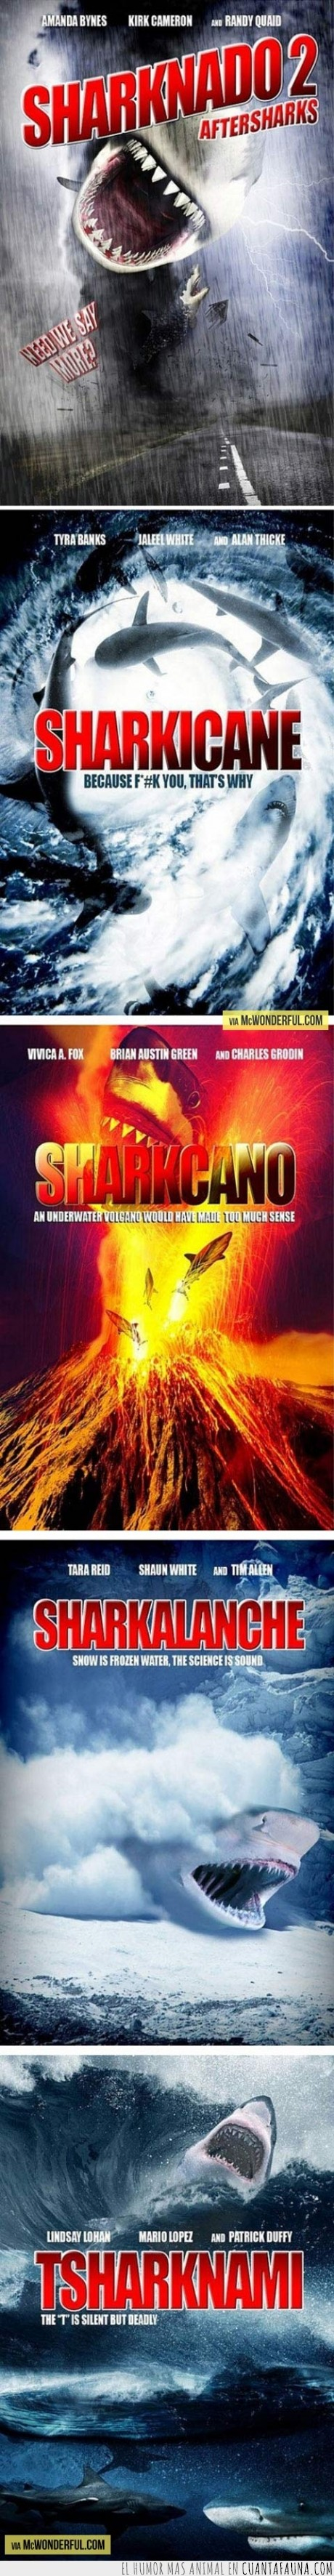 movies,películas,shark,tiburón